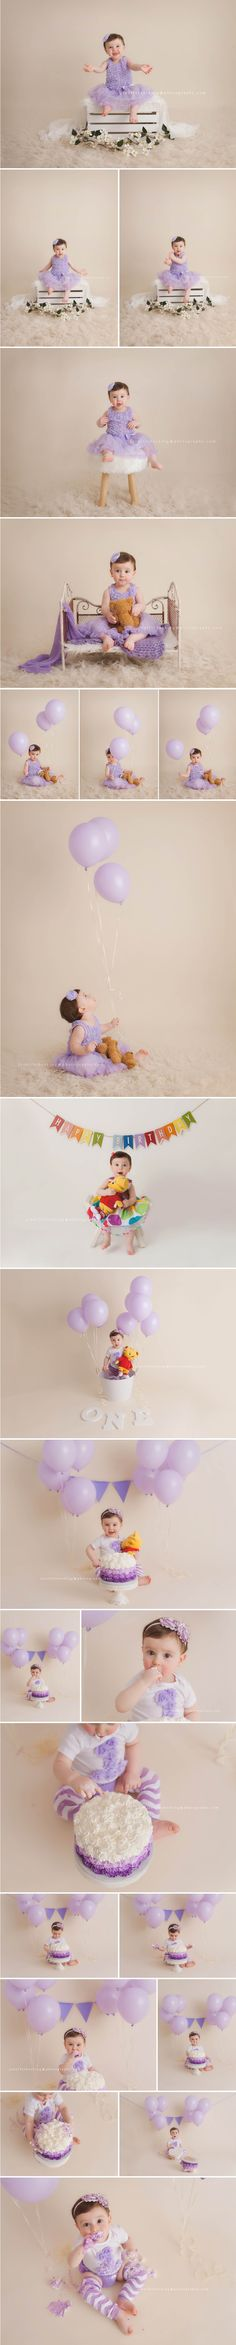 Cake Smash and 12 month milestone baby girl